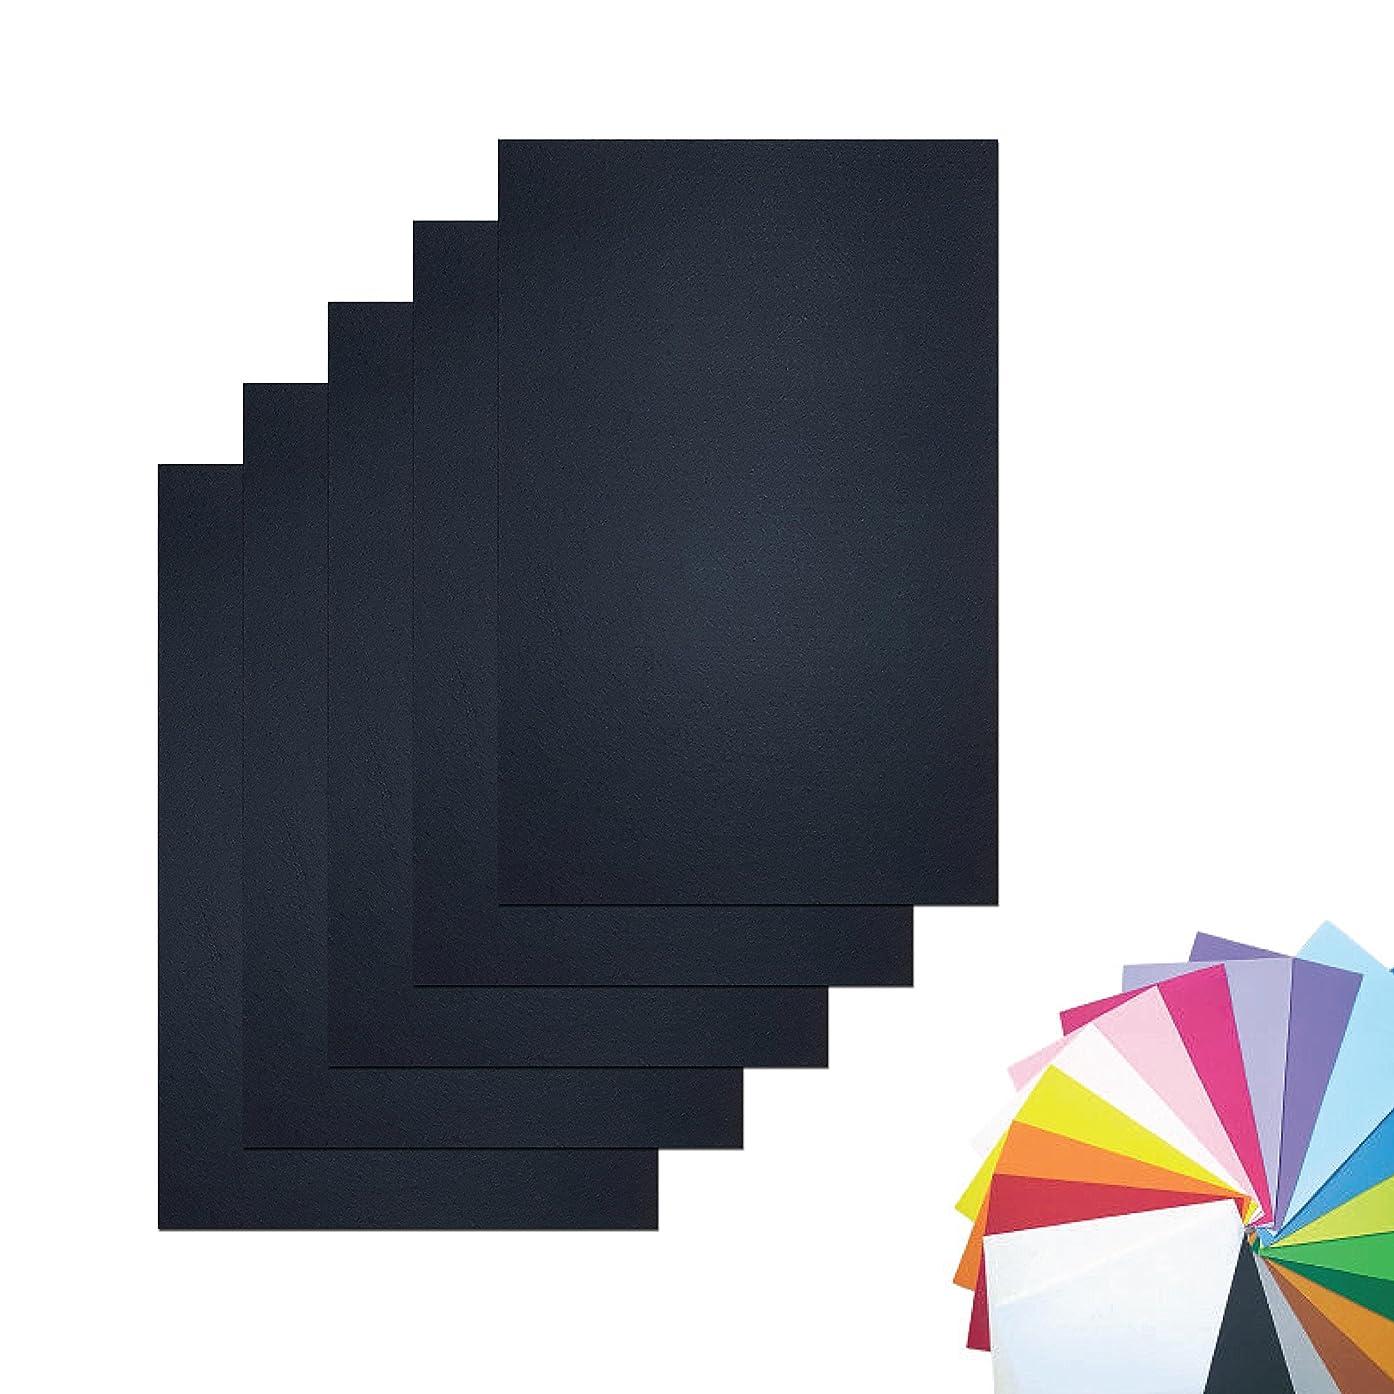 DIY Stiff Felt(Hard Felt) Fabric Squares Sheets Black Color 30cm X 45cm inch for Crafts,1.2mm Thick- Black Color of 5sheets